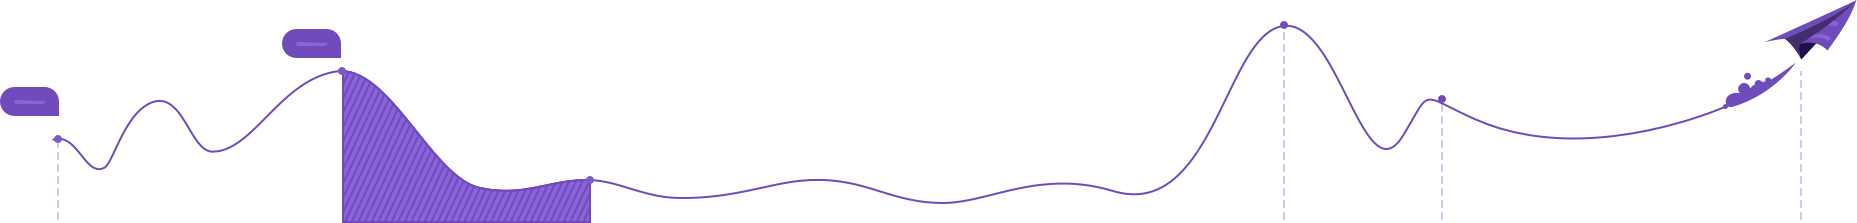 illustration_bg_purple-min.png